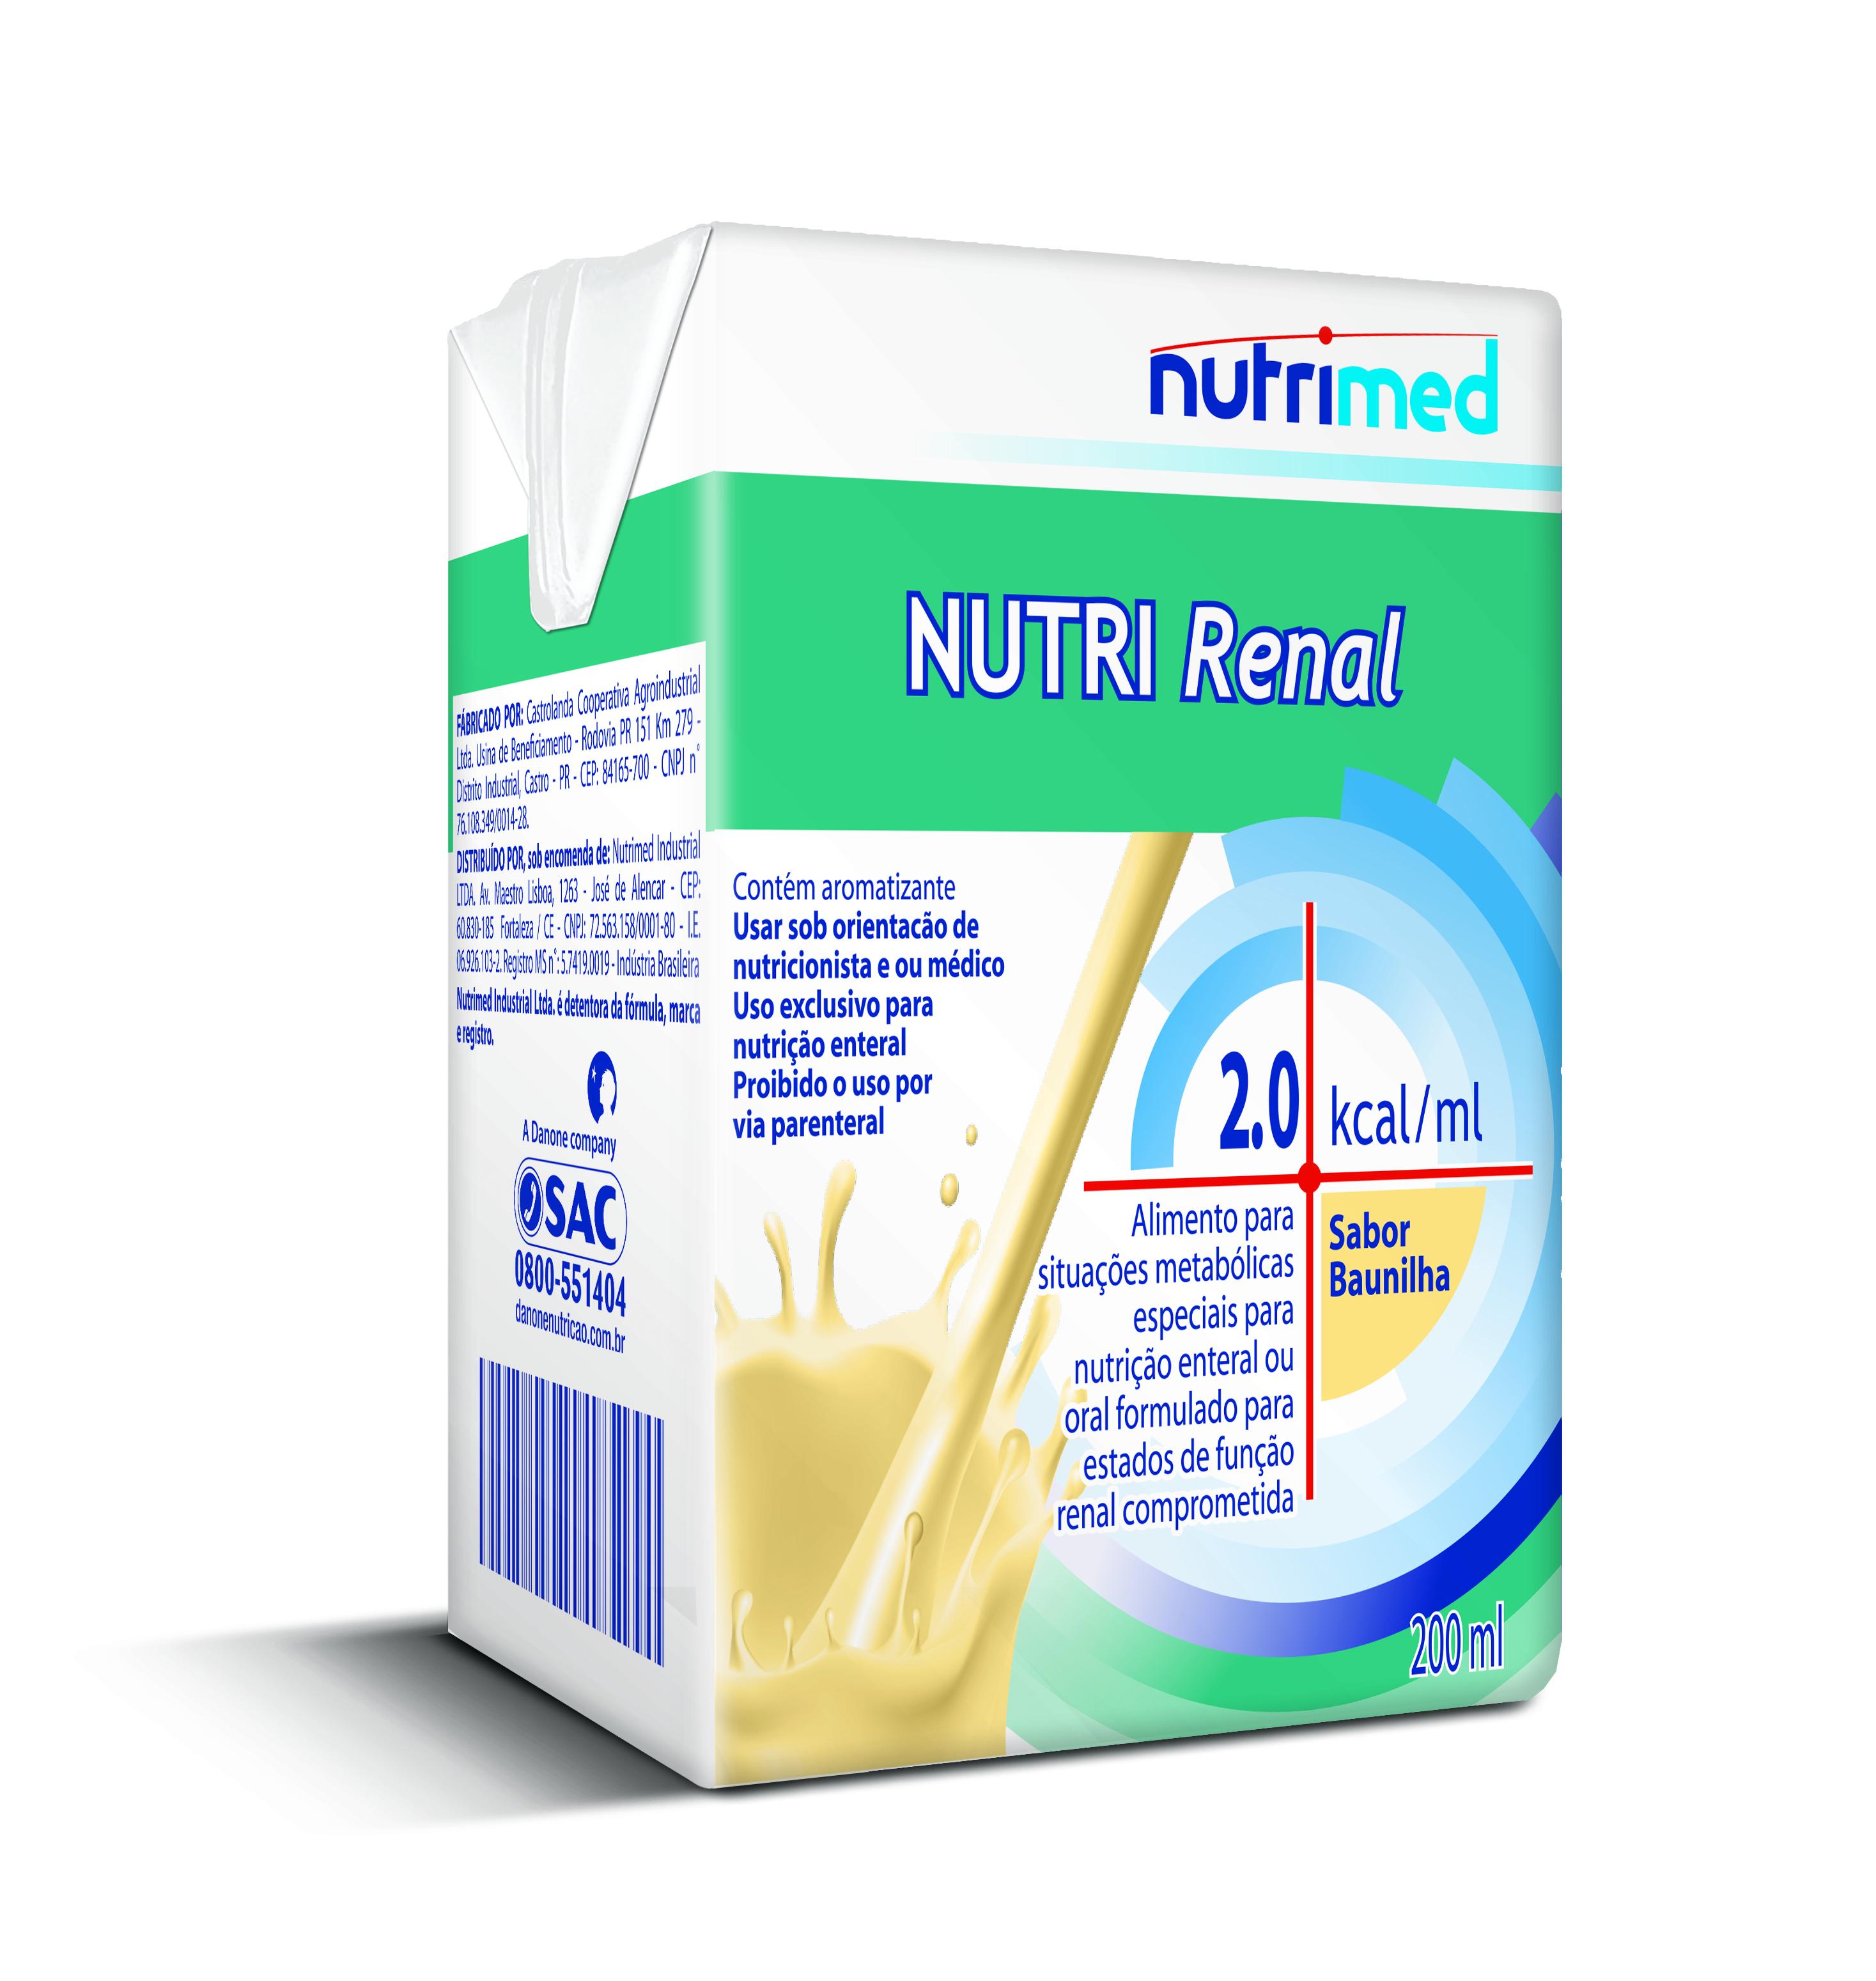 NUTRIMED-mockup-200ML-RENAL